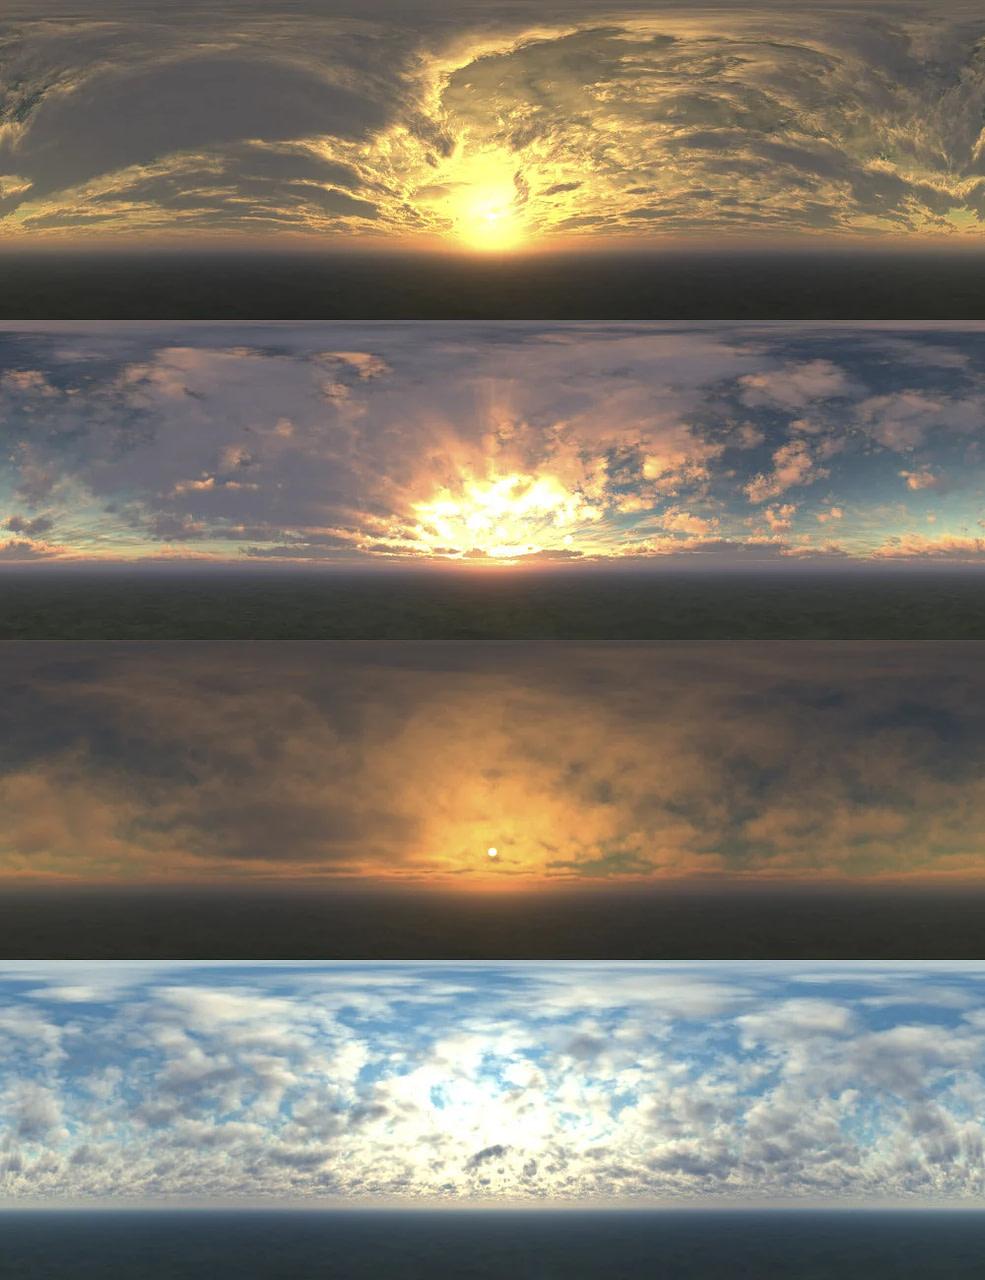 daz studio skies of